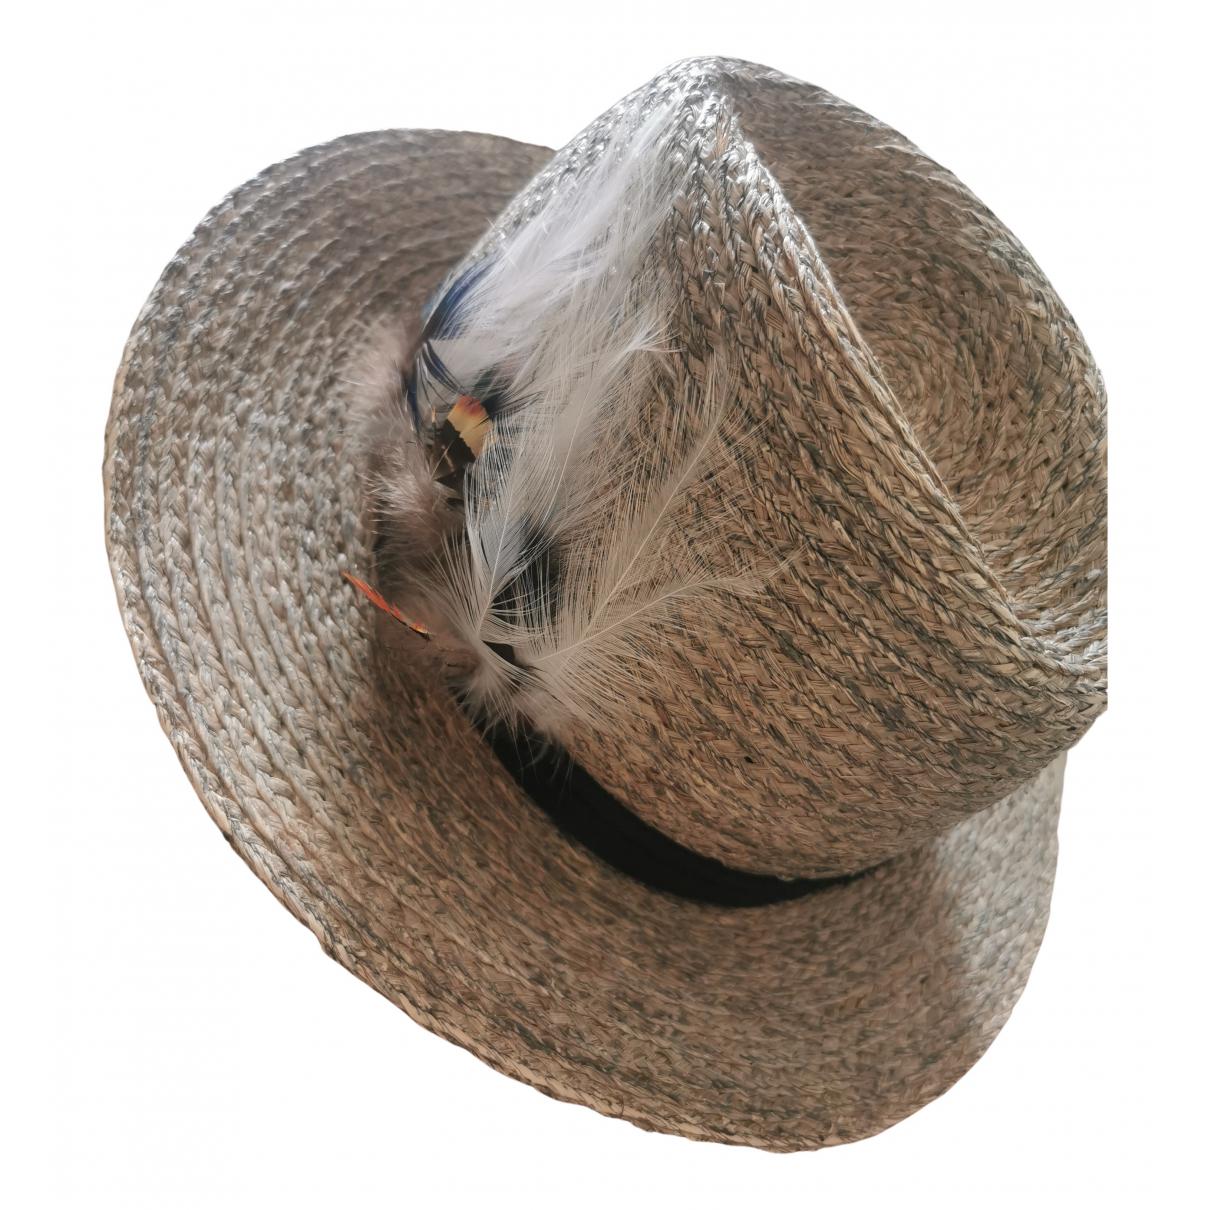 Zadig & Voltaire Spring Summer 2020 Grey Wicker hat for Women 57 cm